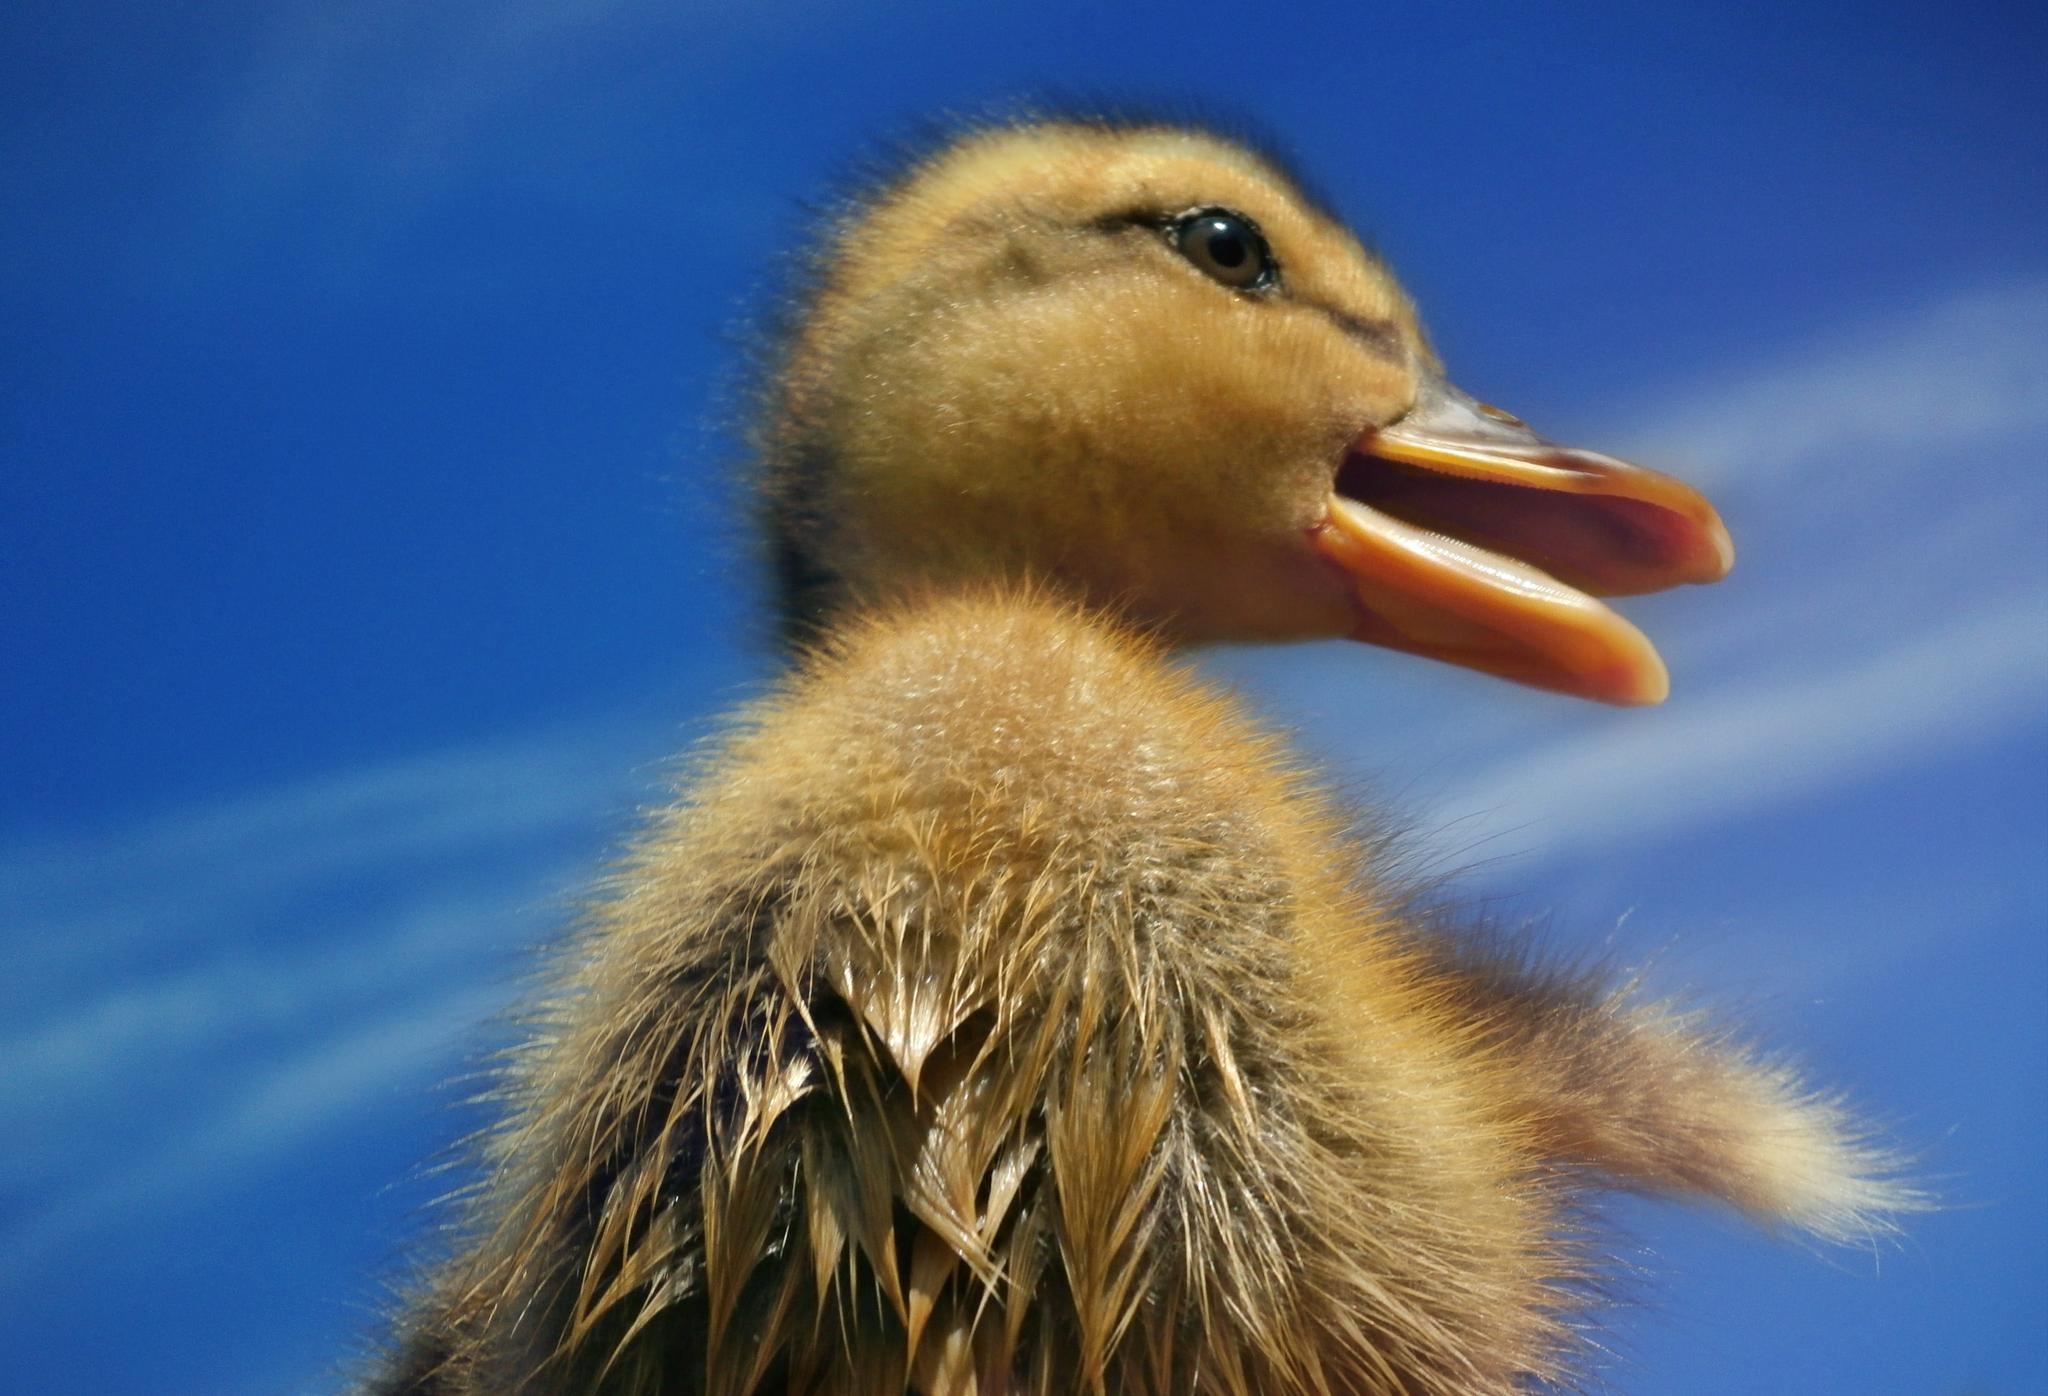 Singing duck by ksenija.glavak